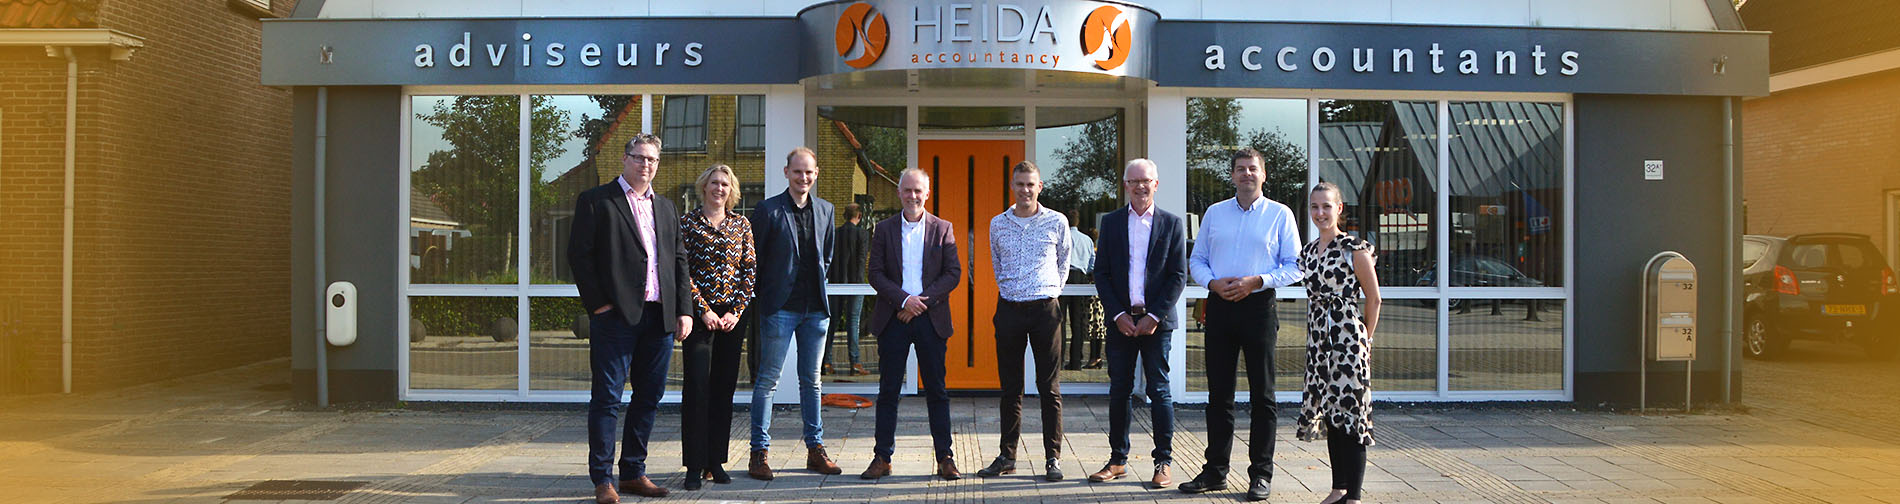 Personeel Heida Accountancy